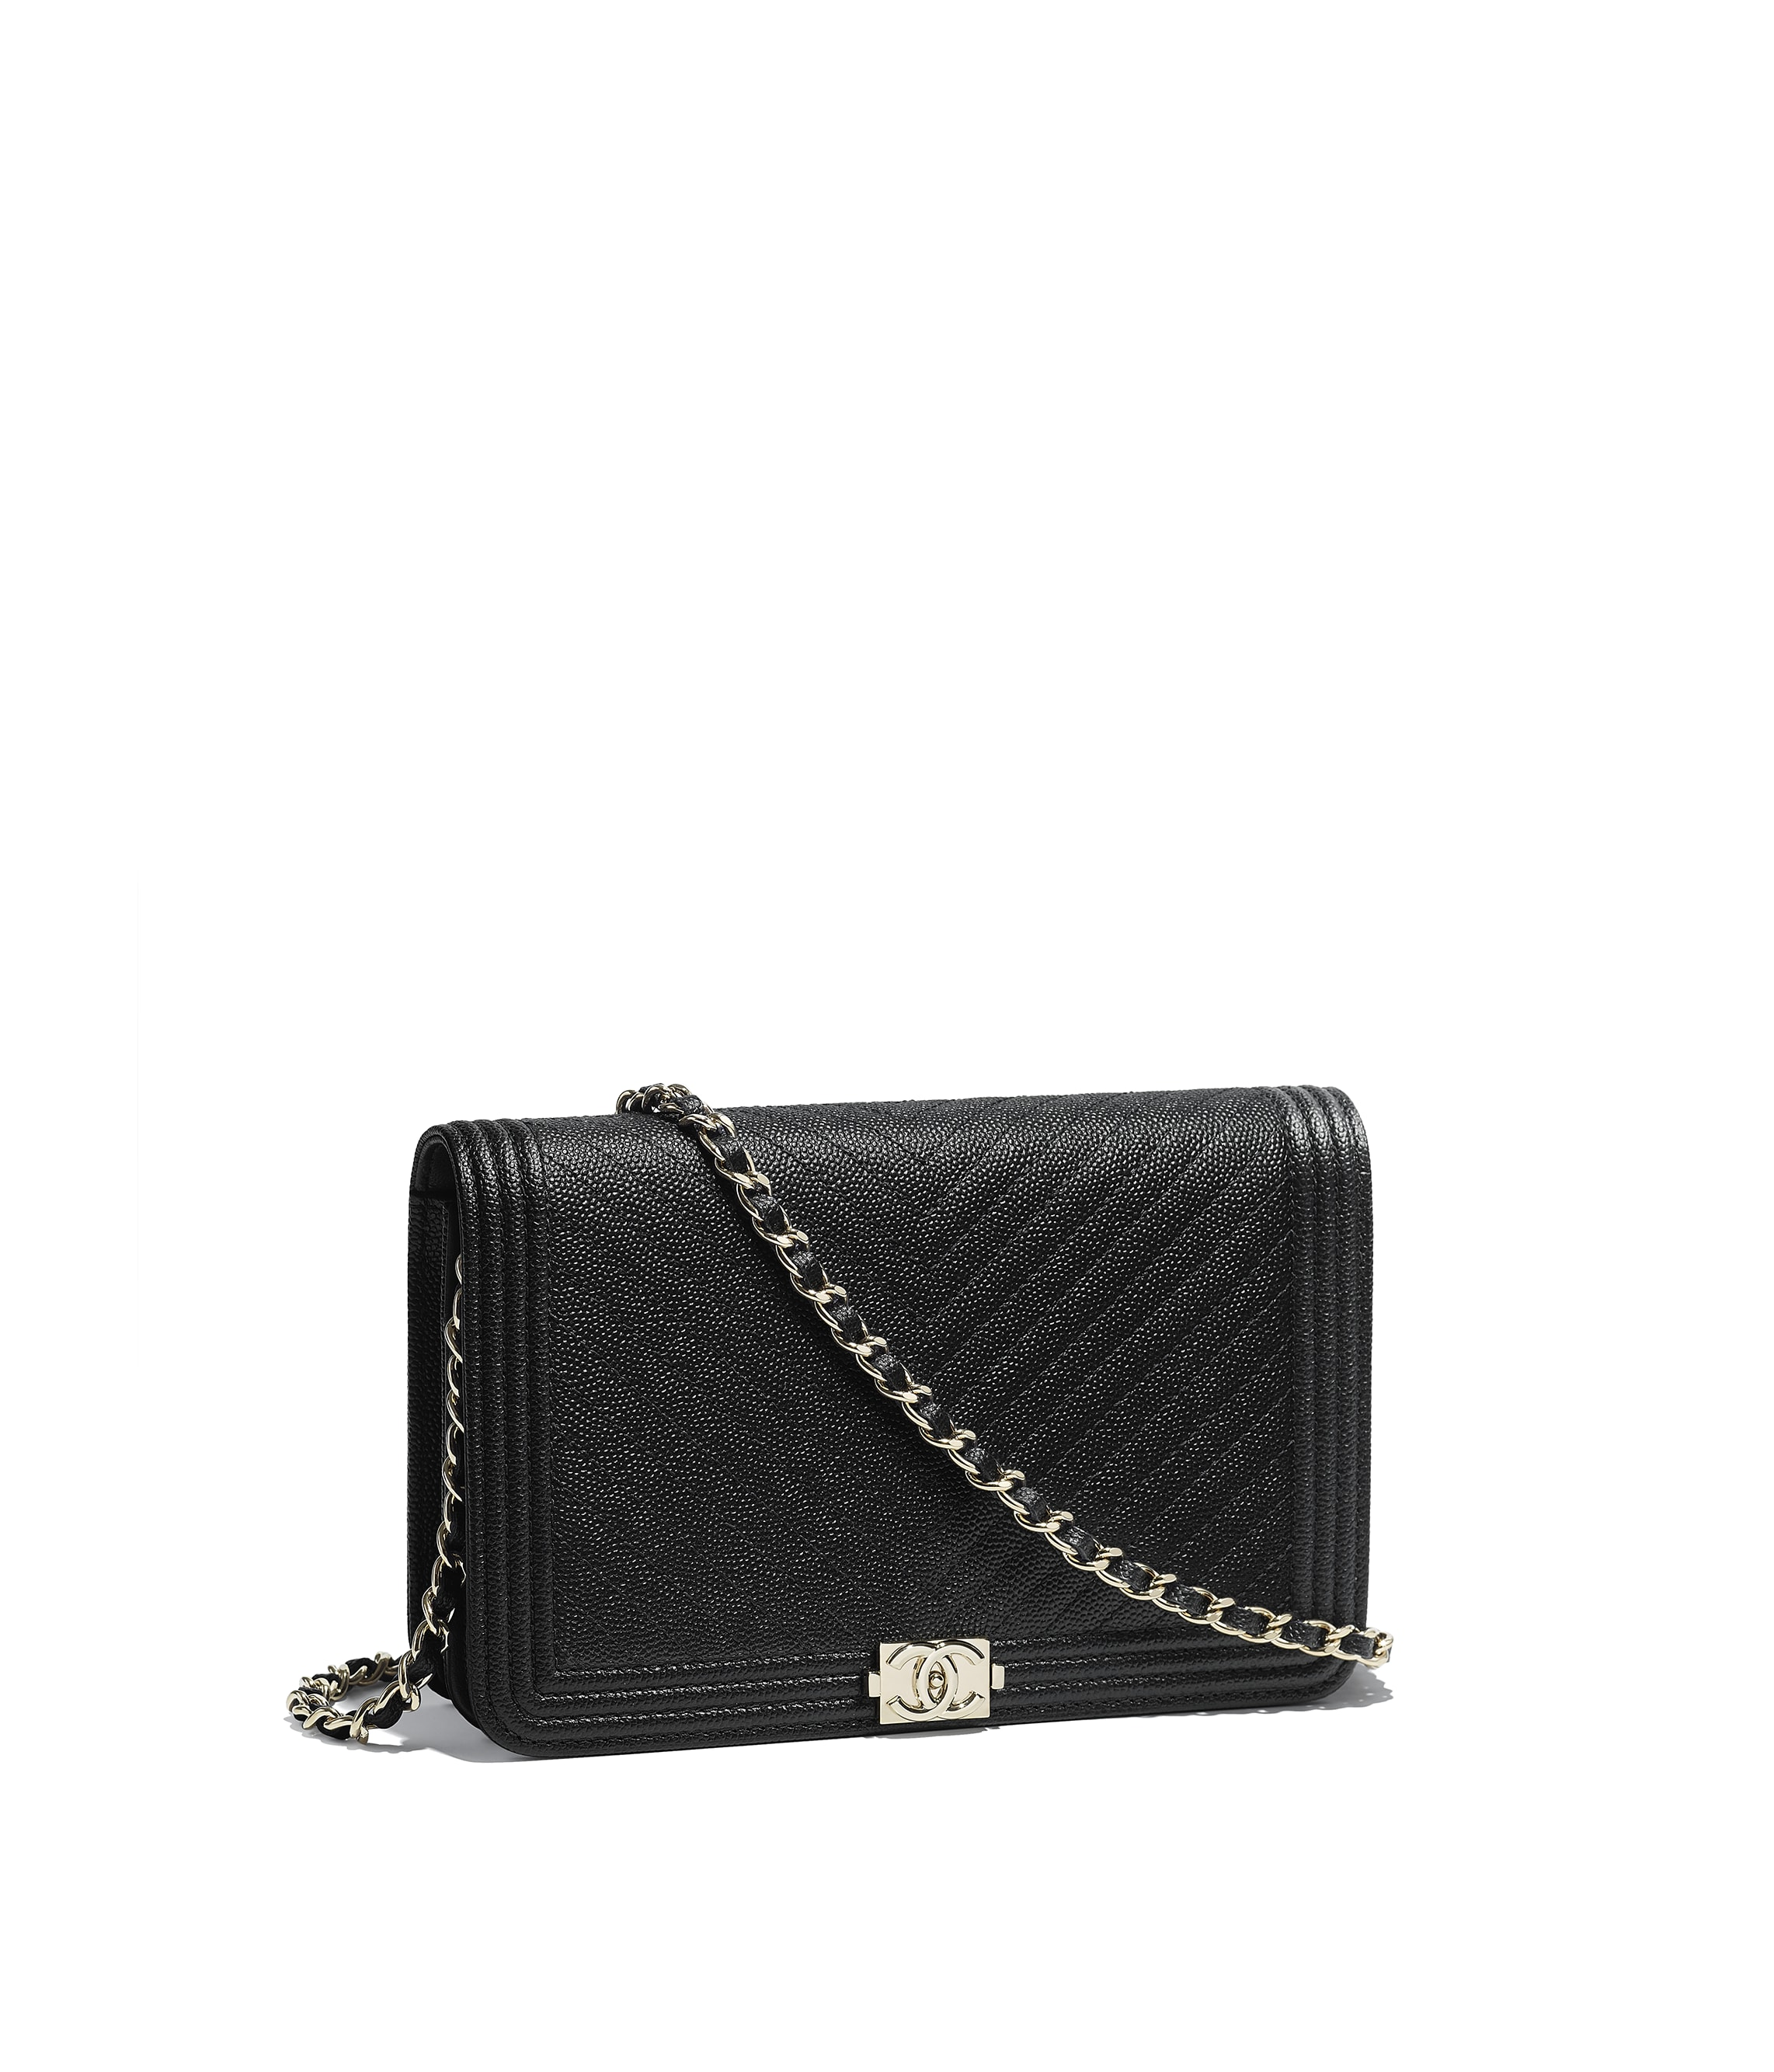 ab843c9388ce Chanel Classic Wallet On Chain Grained Lambskin. Lambskin & Gold-Tone Metal  Black BOY ...